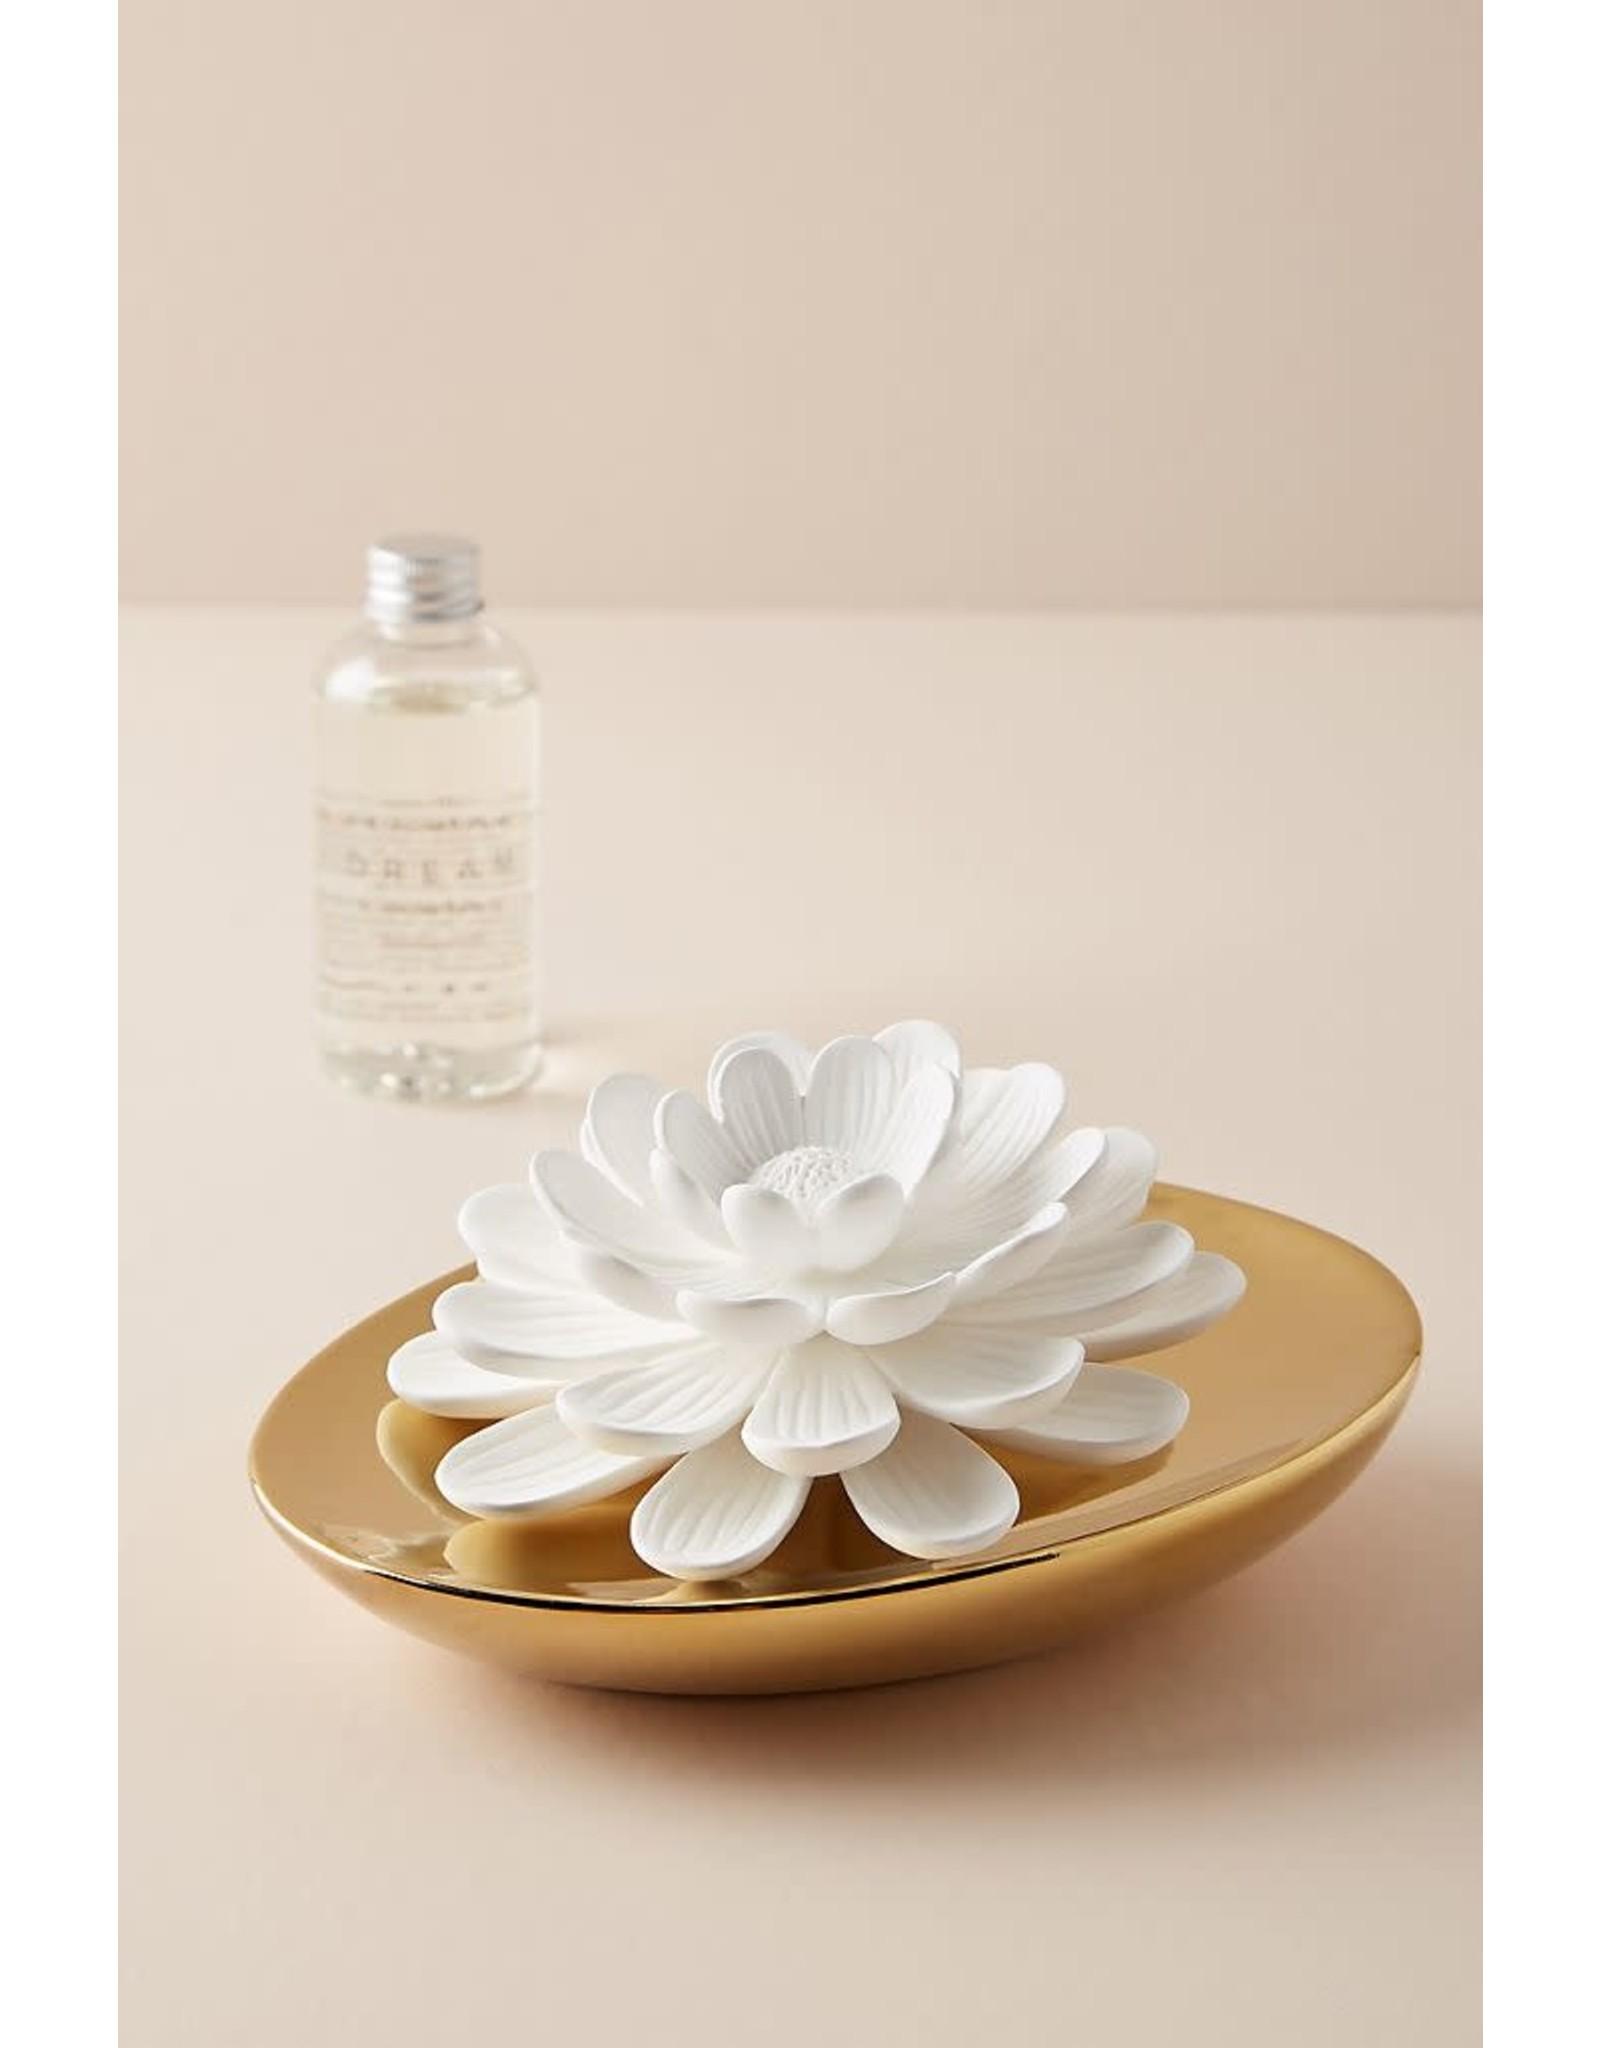 Oak + Arrow Interiors Dream Porcelain Flower Diffuser REFILL